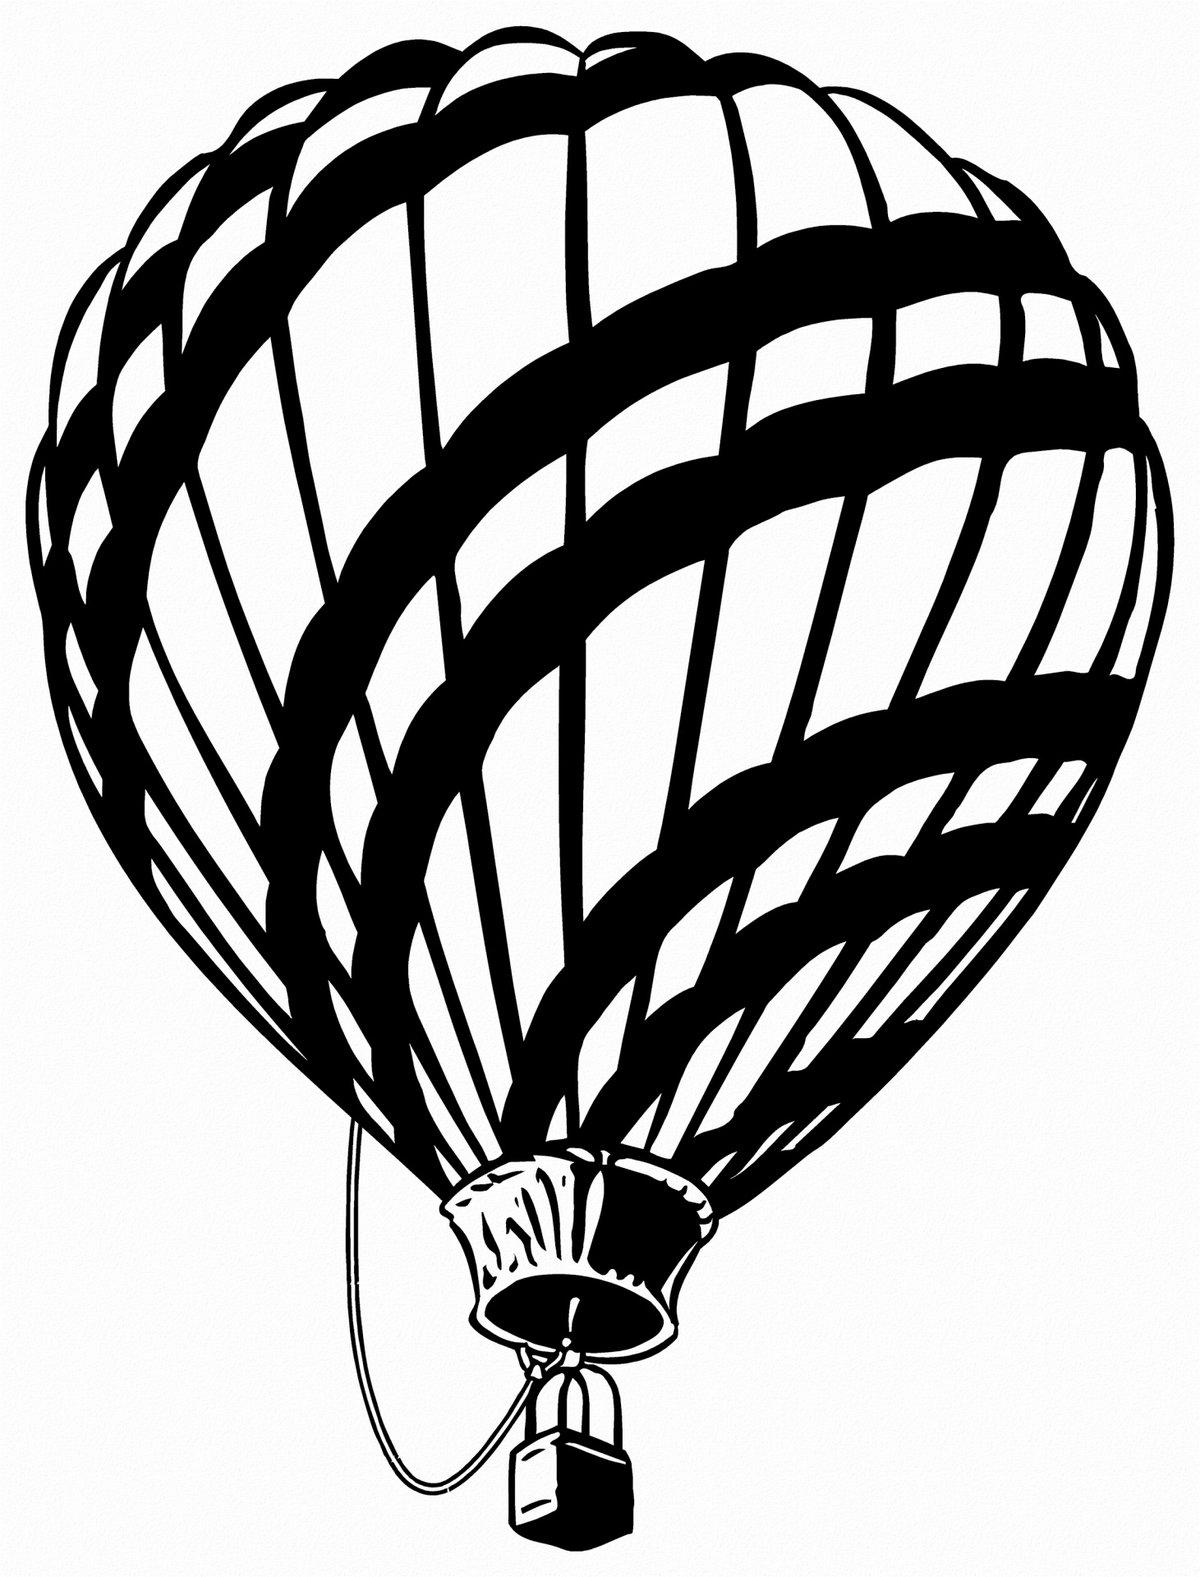 картинки шарики черно-белые на прозрачном фоне орску